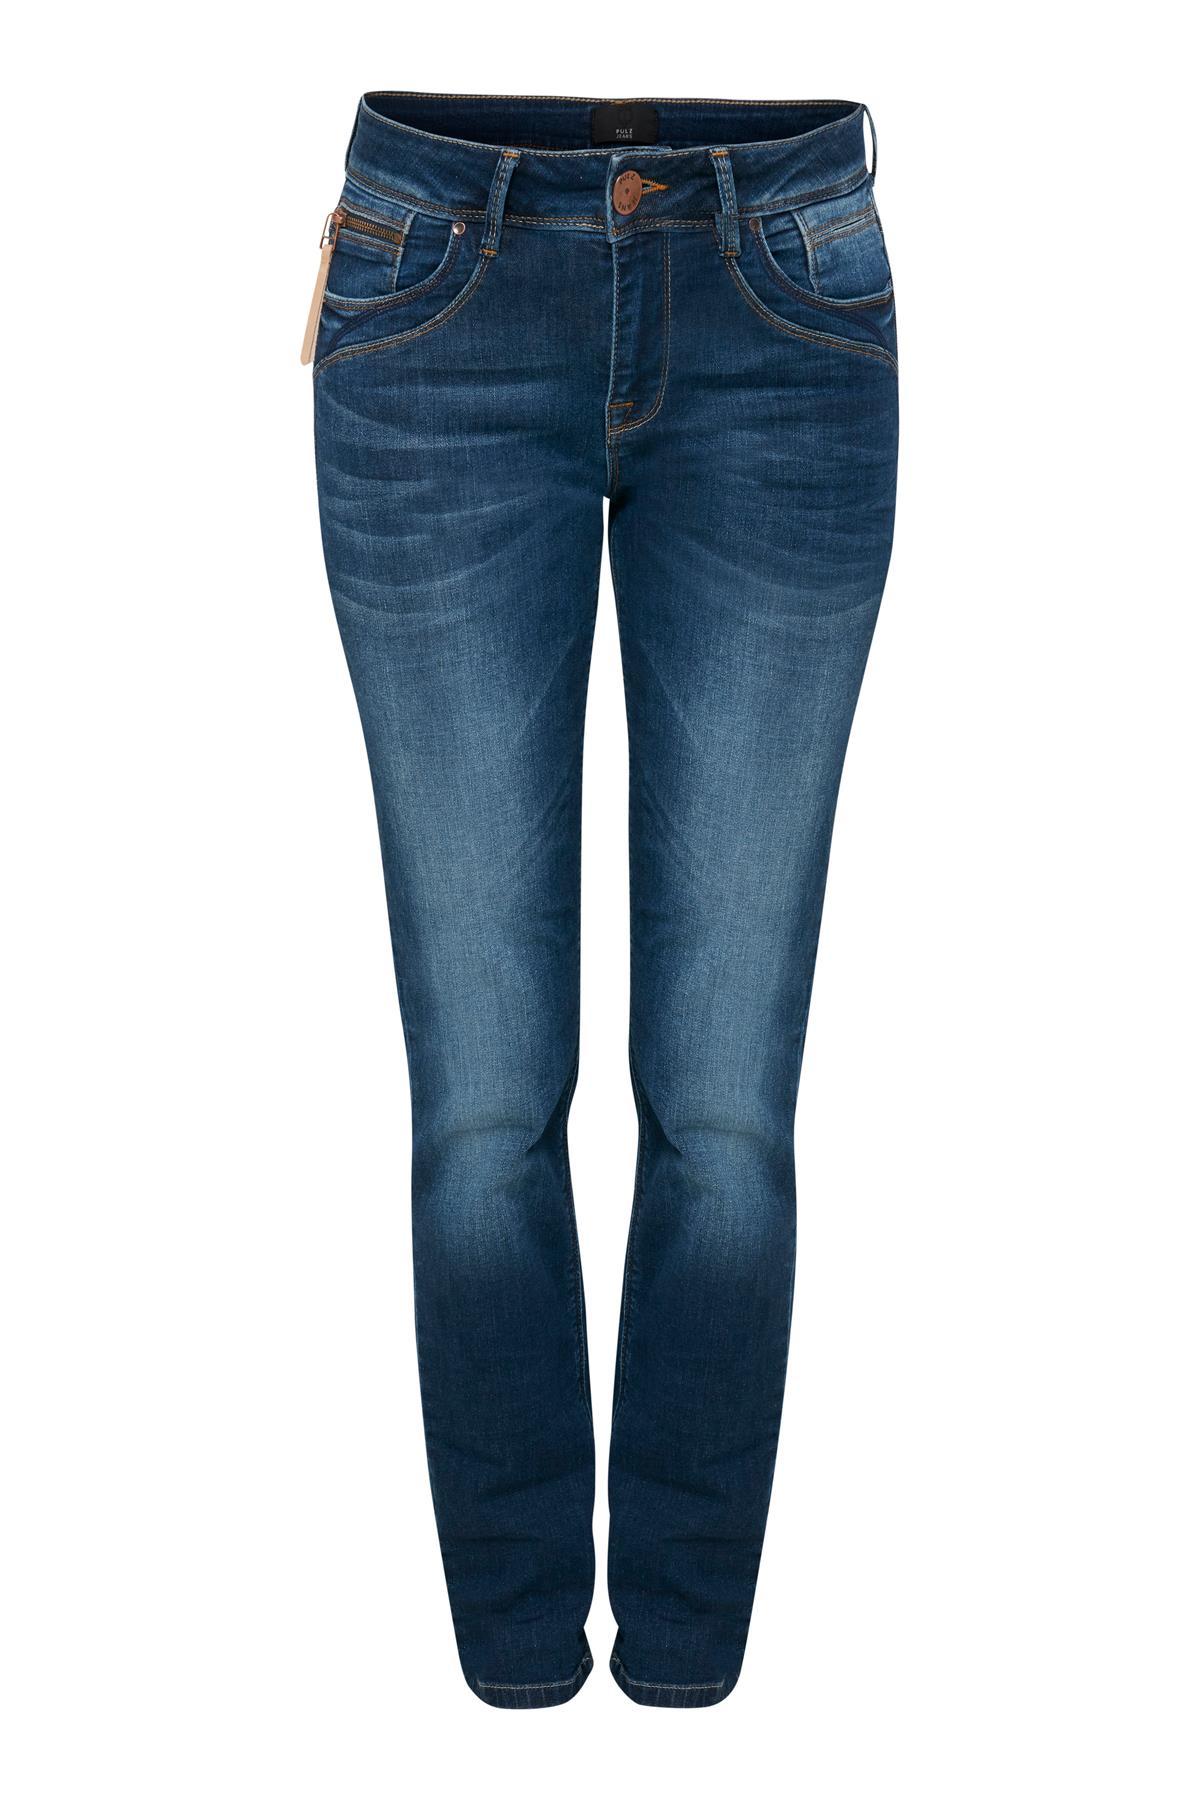 Image of Pulz Jeans Dame Jeans - Denimblå